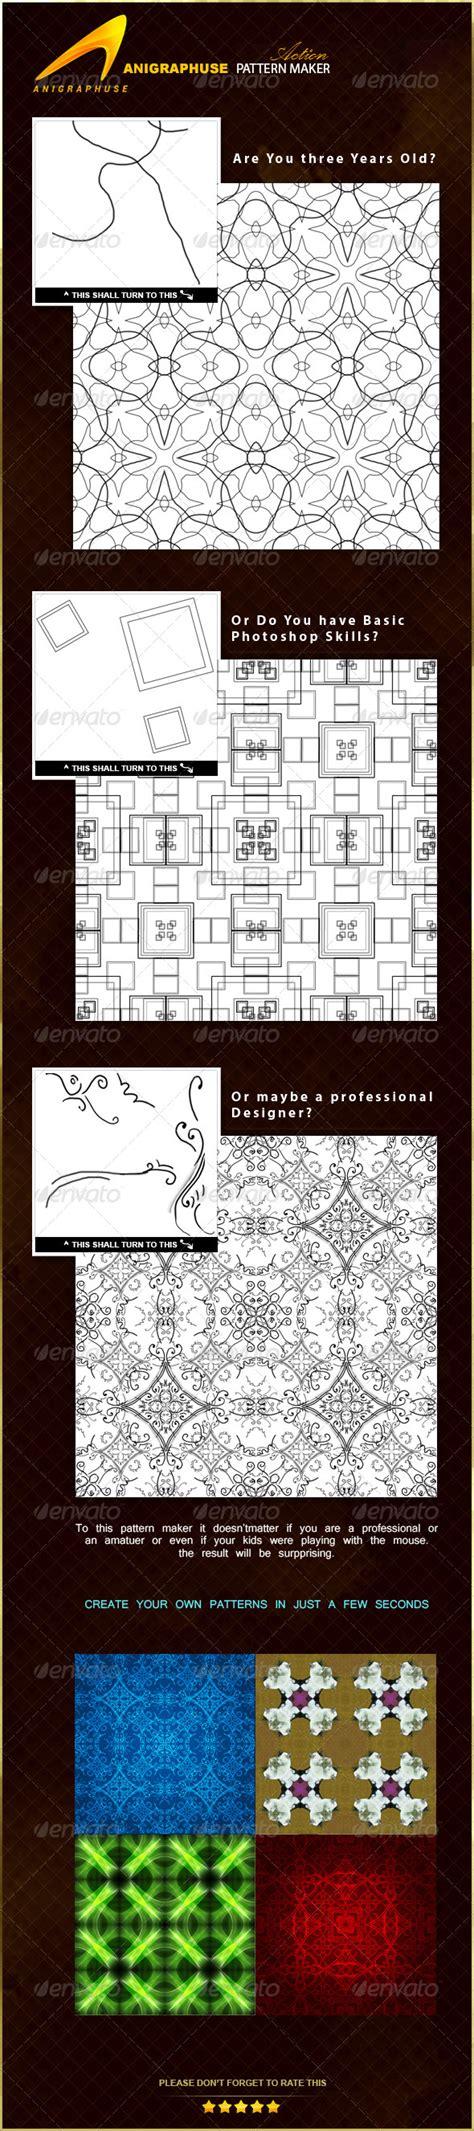 seamless pattern online generator free portrait perler bead pattern maker 187 tinkytyler org